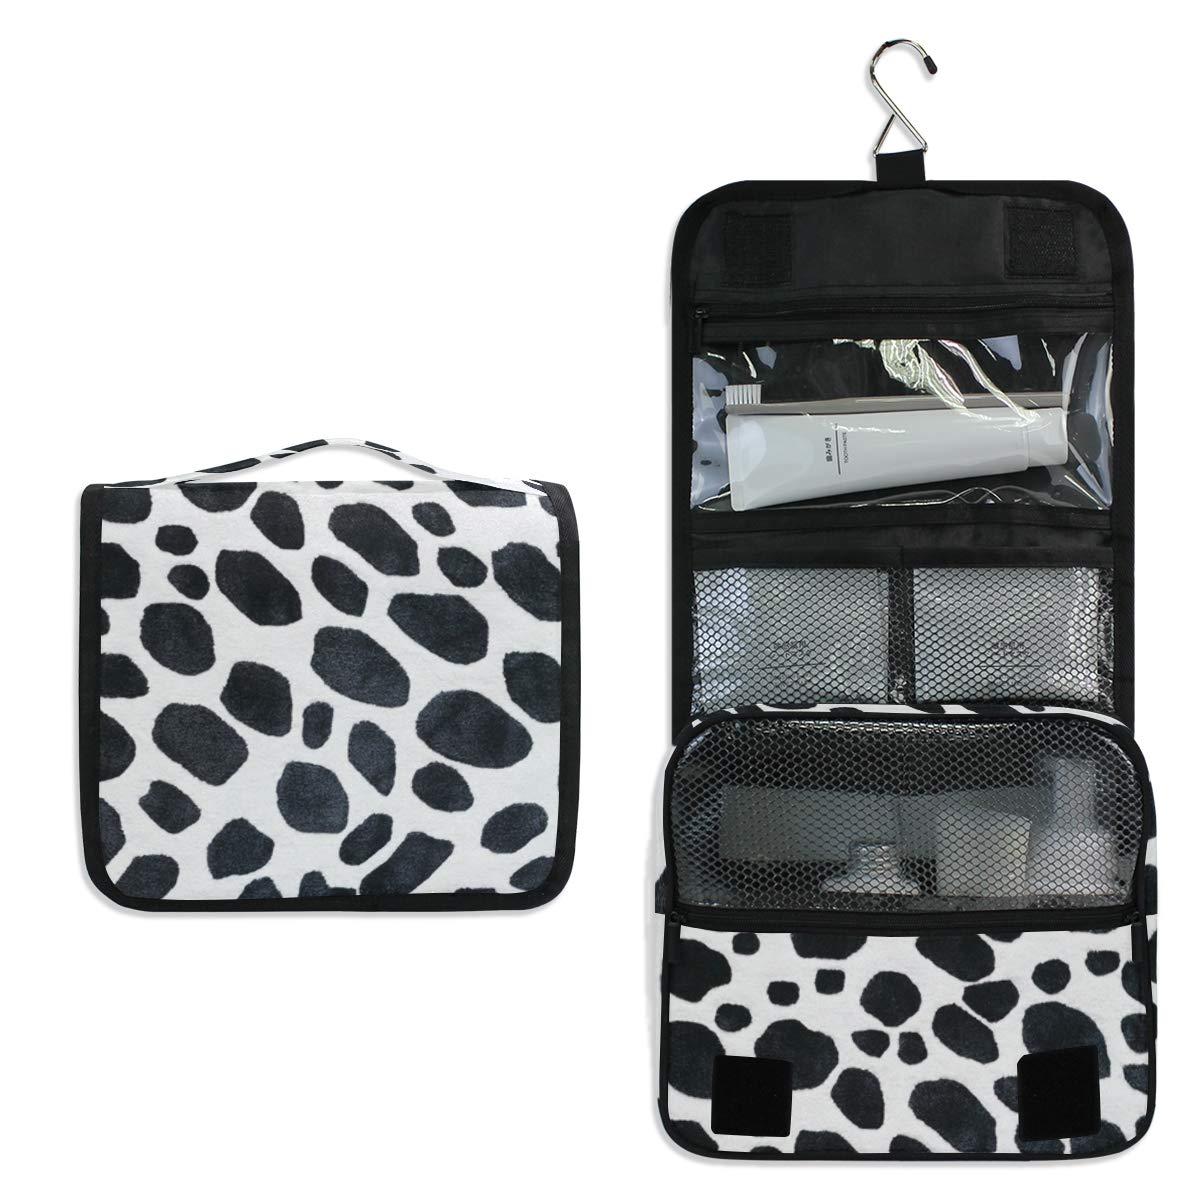 Toiletry Bag Travel Bag Hanging Hook - Dalmatian Spots Waterproof Cosmetic Bag Portable Makeup Pouch for Toiletries Bathroom